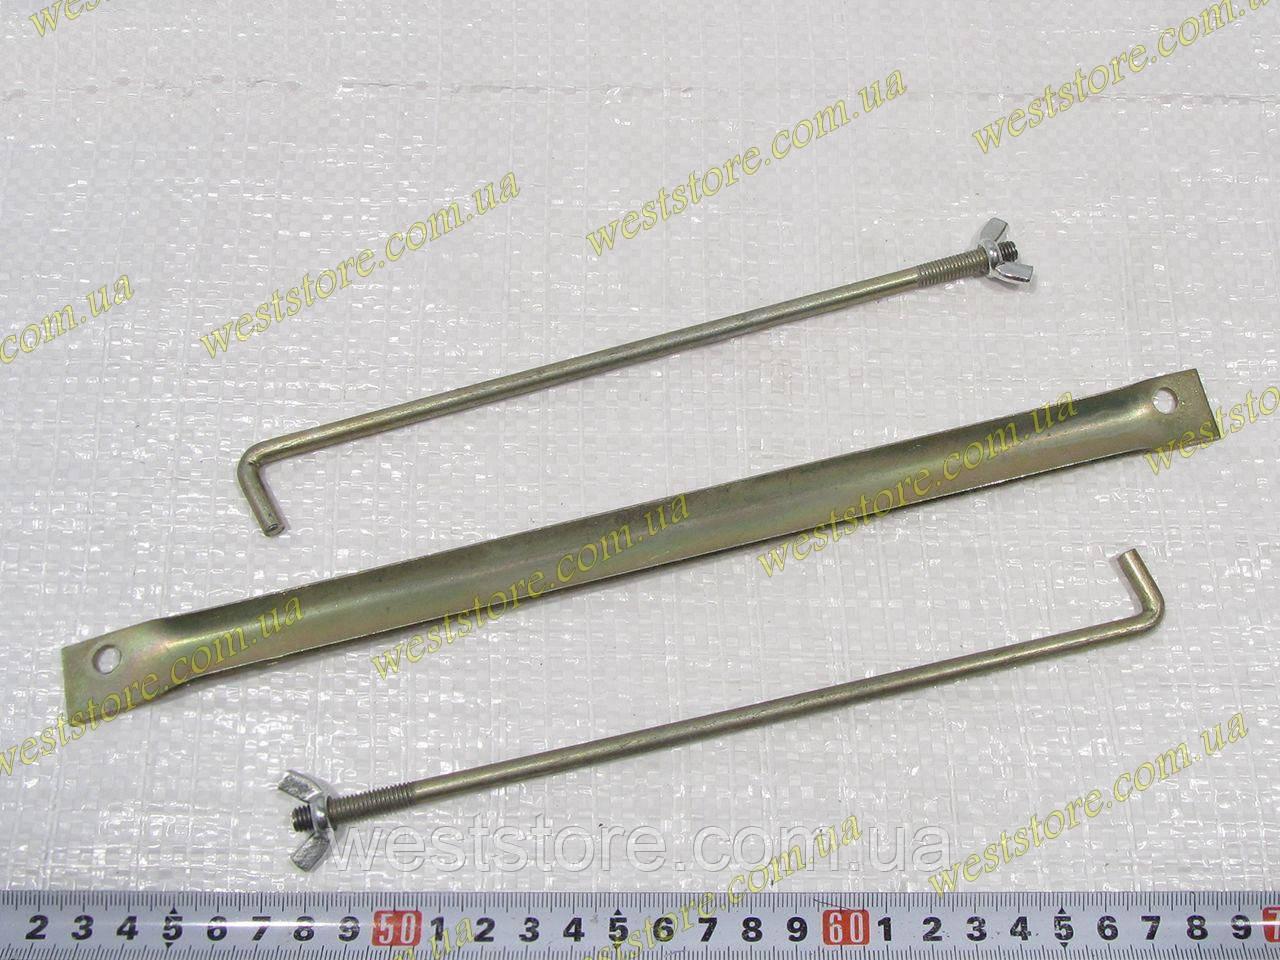 Крепление АКБ аккумулятора Ваз 2101 2102 2103 2104 2105 2106 2107 (планка+шпильки+барашки)